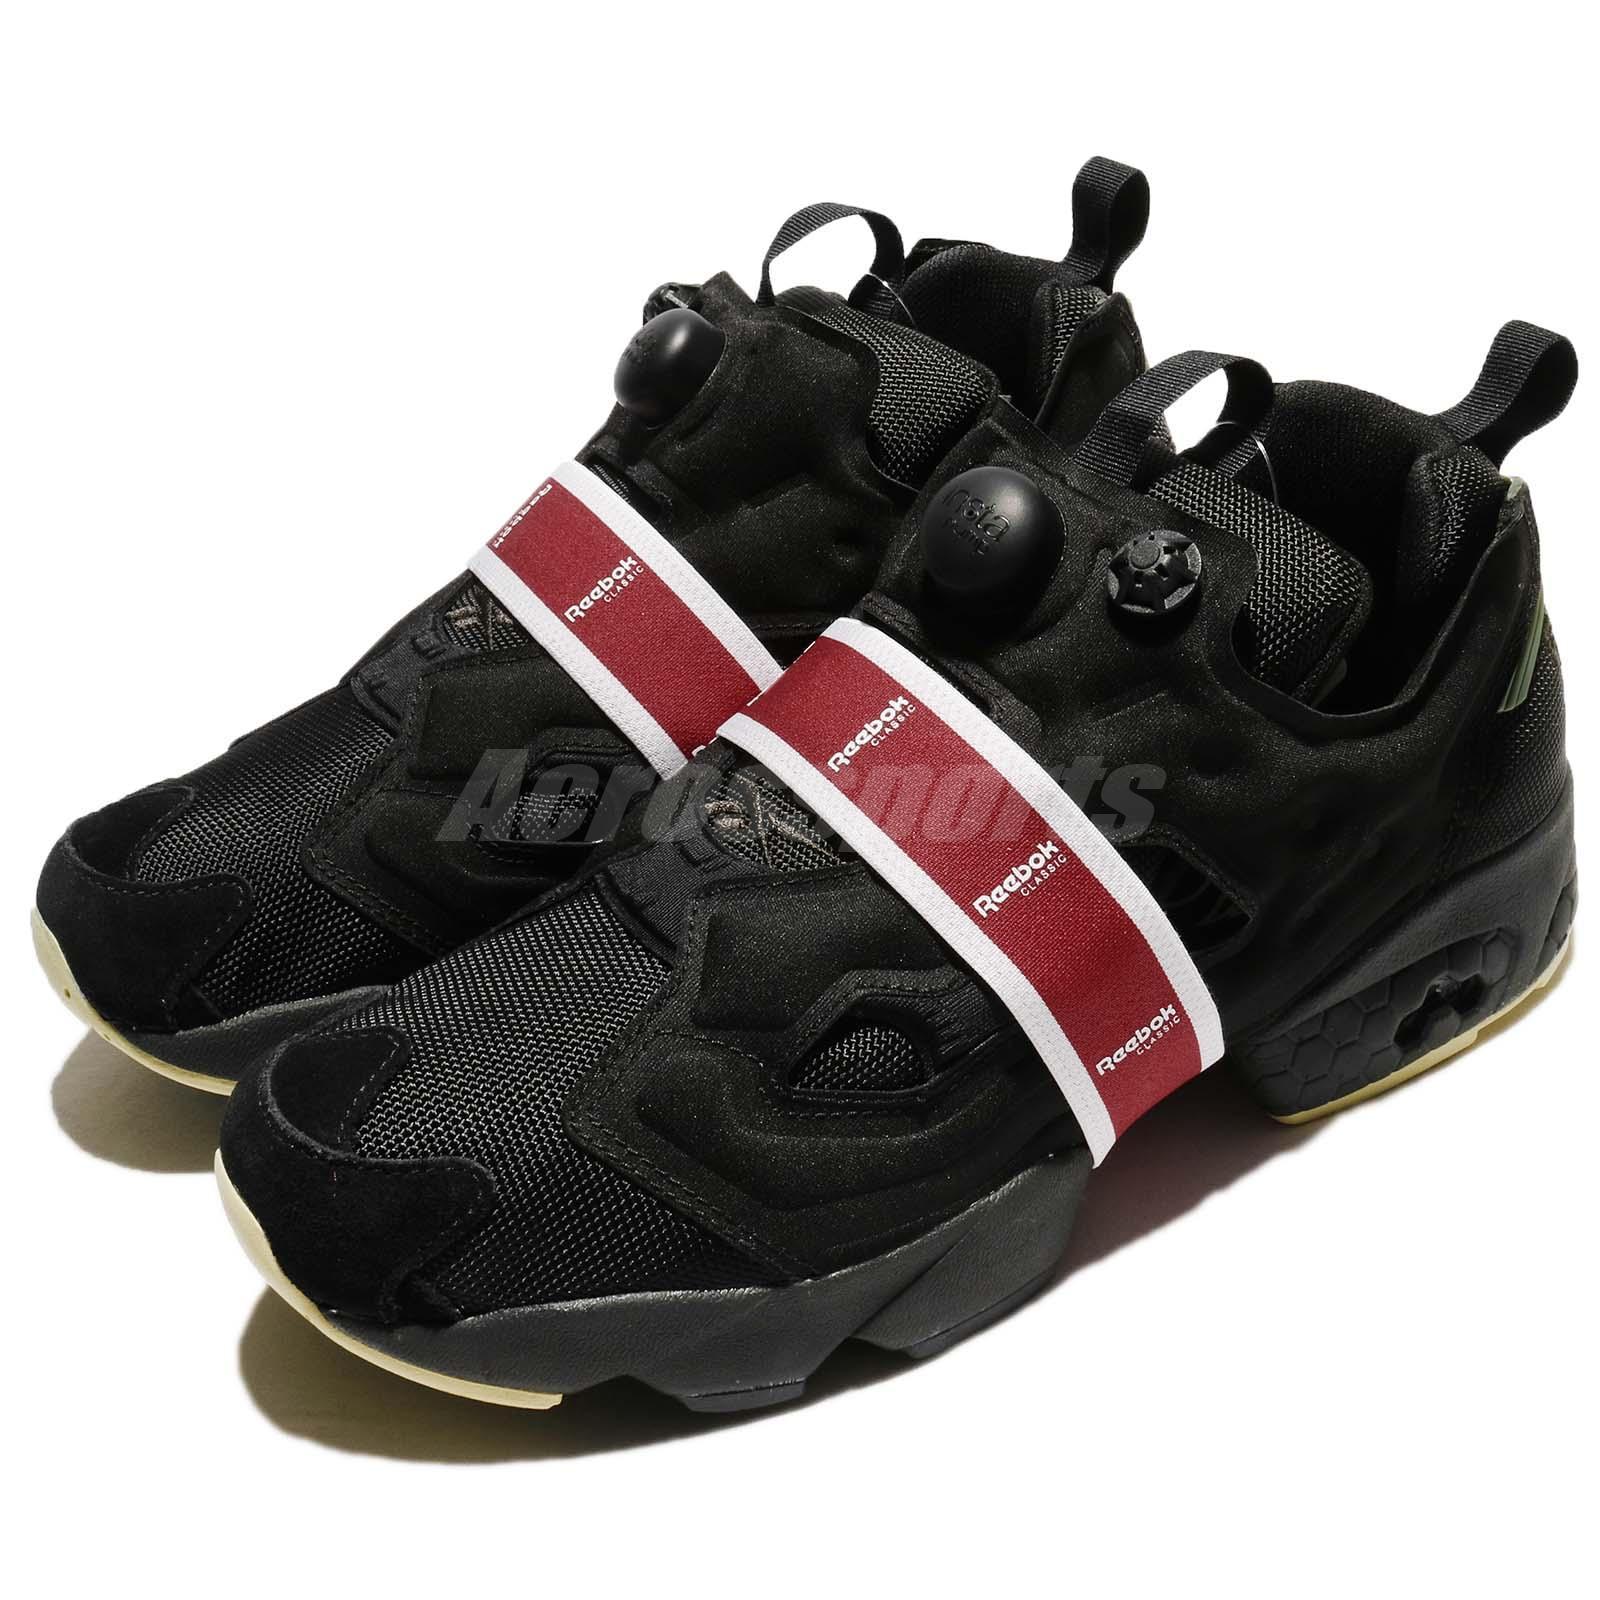 Details about Reebok Instapump Fury OG MB Black Coal Red Men Running Shoes  Sneakers BS9730 b3b317cd7